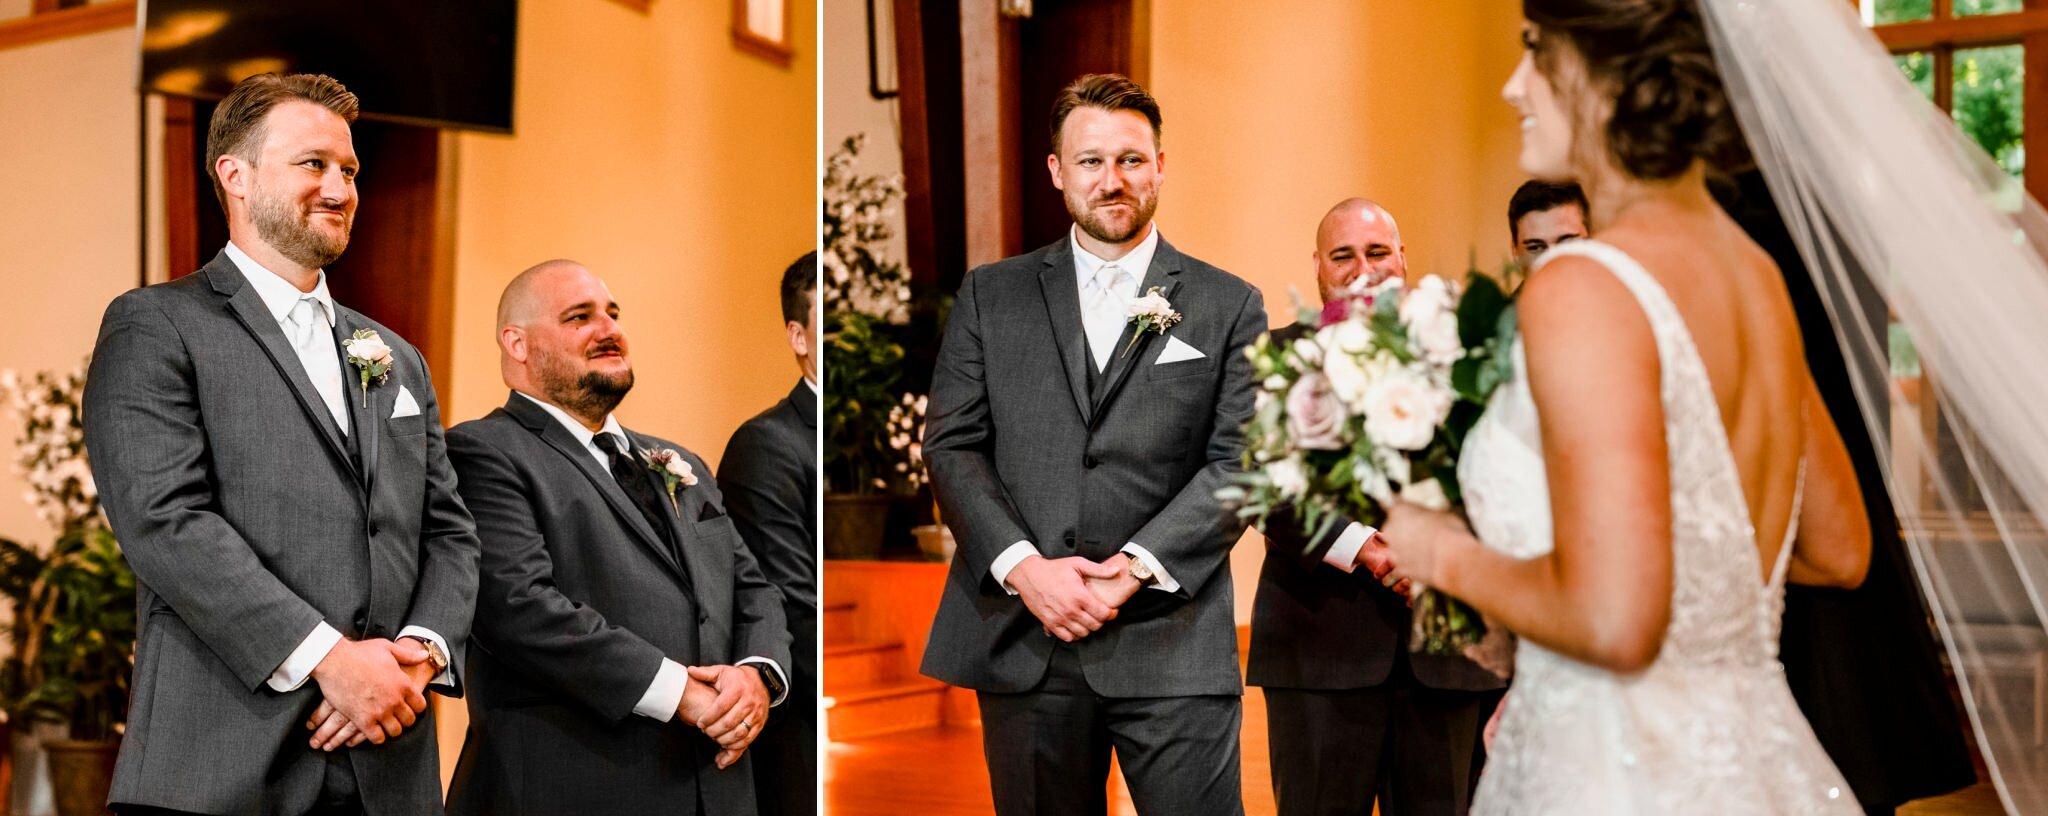 Coyle-Forsgate-Country-Club-Wedding-Photographer-64.JPG